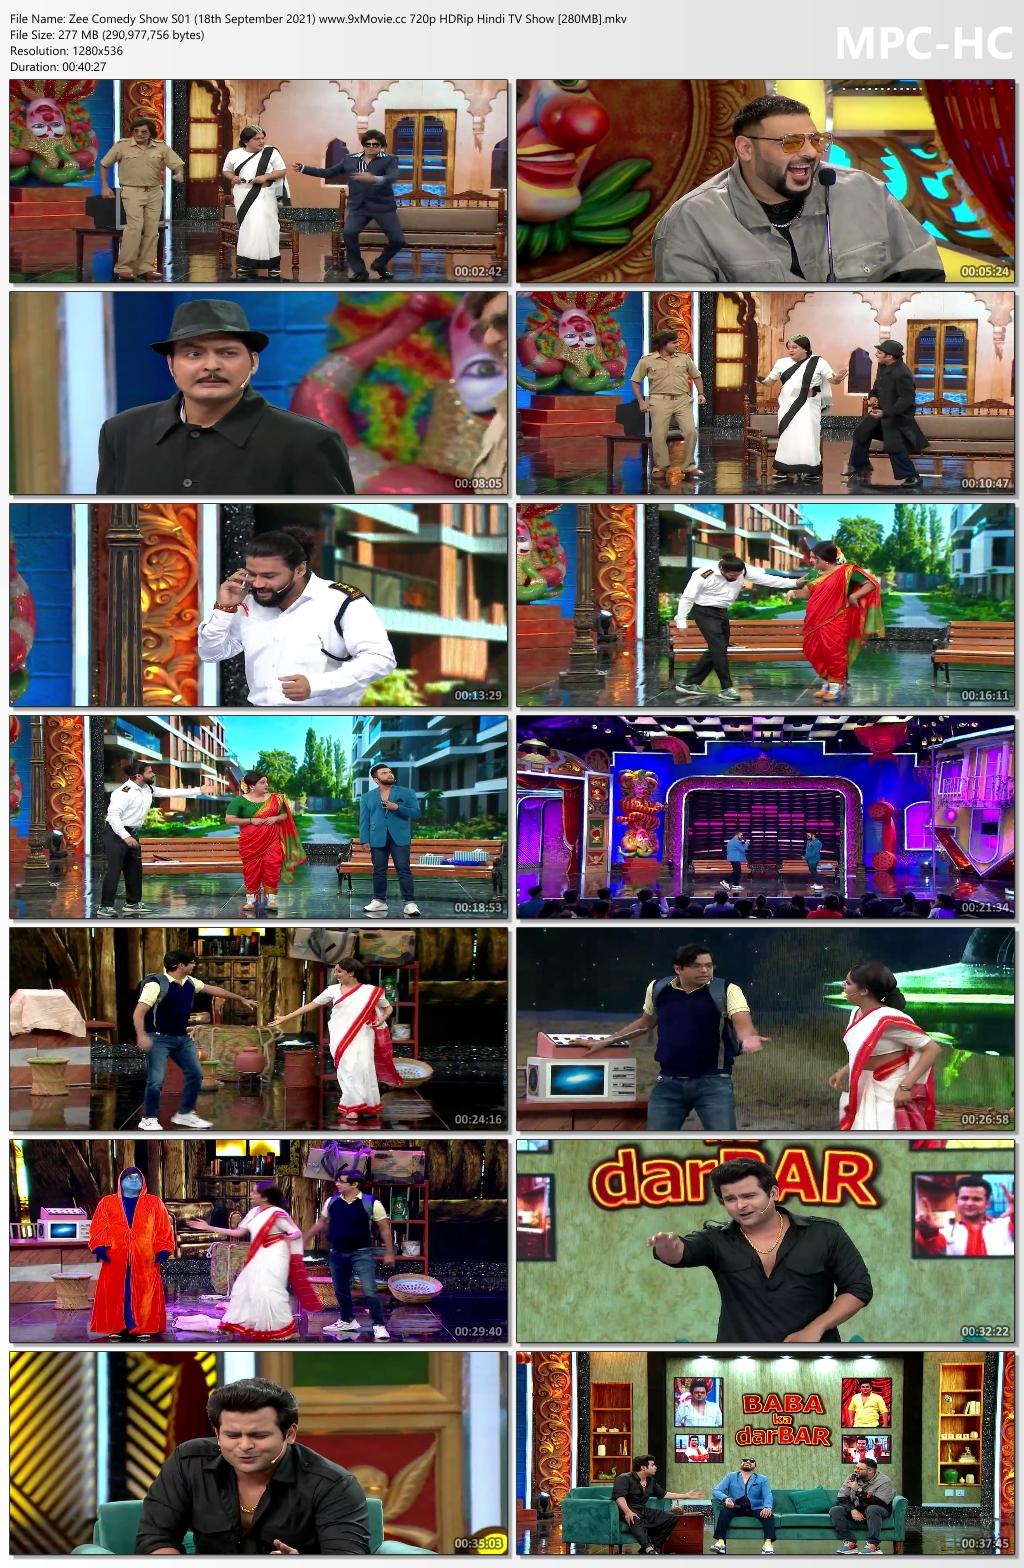 Zee-Comedy-Show-S01-18th-September-2021-www-9x-Movie-cc-720p-HDRip-Hindi-TV-Show-280-MB-mkv